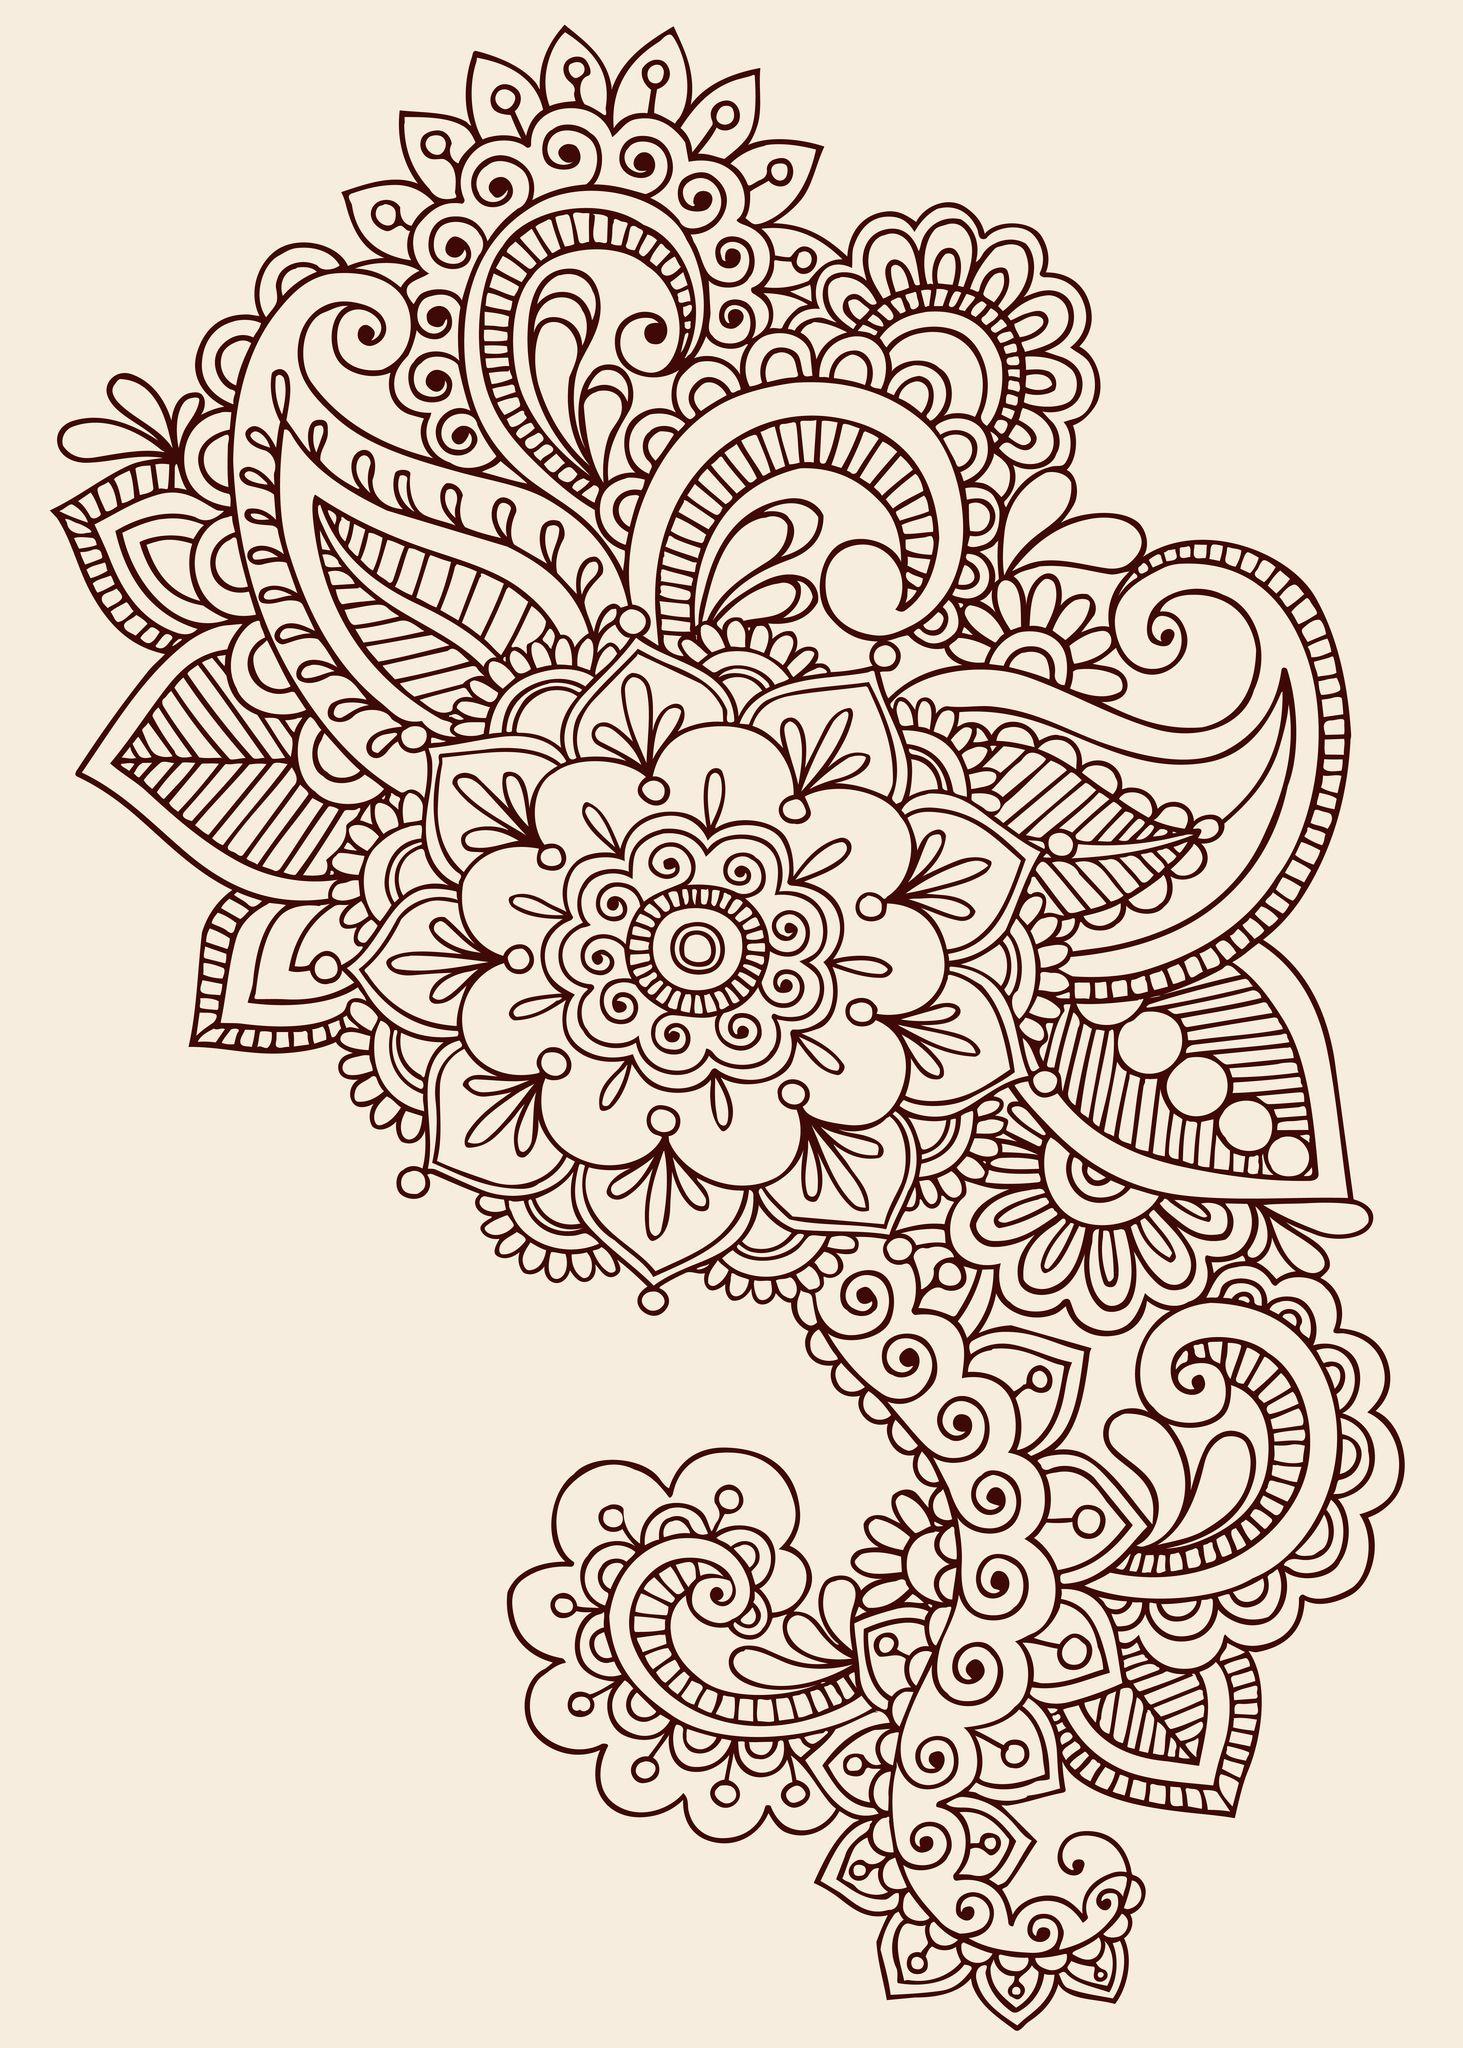 paisley designs paisley henna tattoo design tattoos pinterest rh pinterest co uk Paisley Tattoos On Pinterest Colorful Paisley Tattoo Ideas